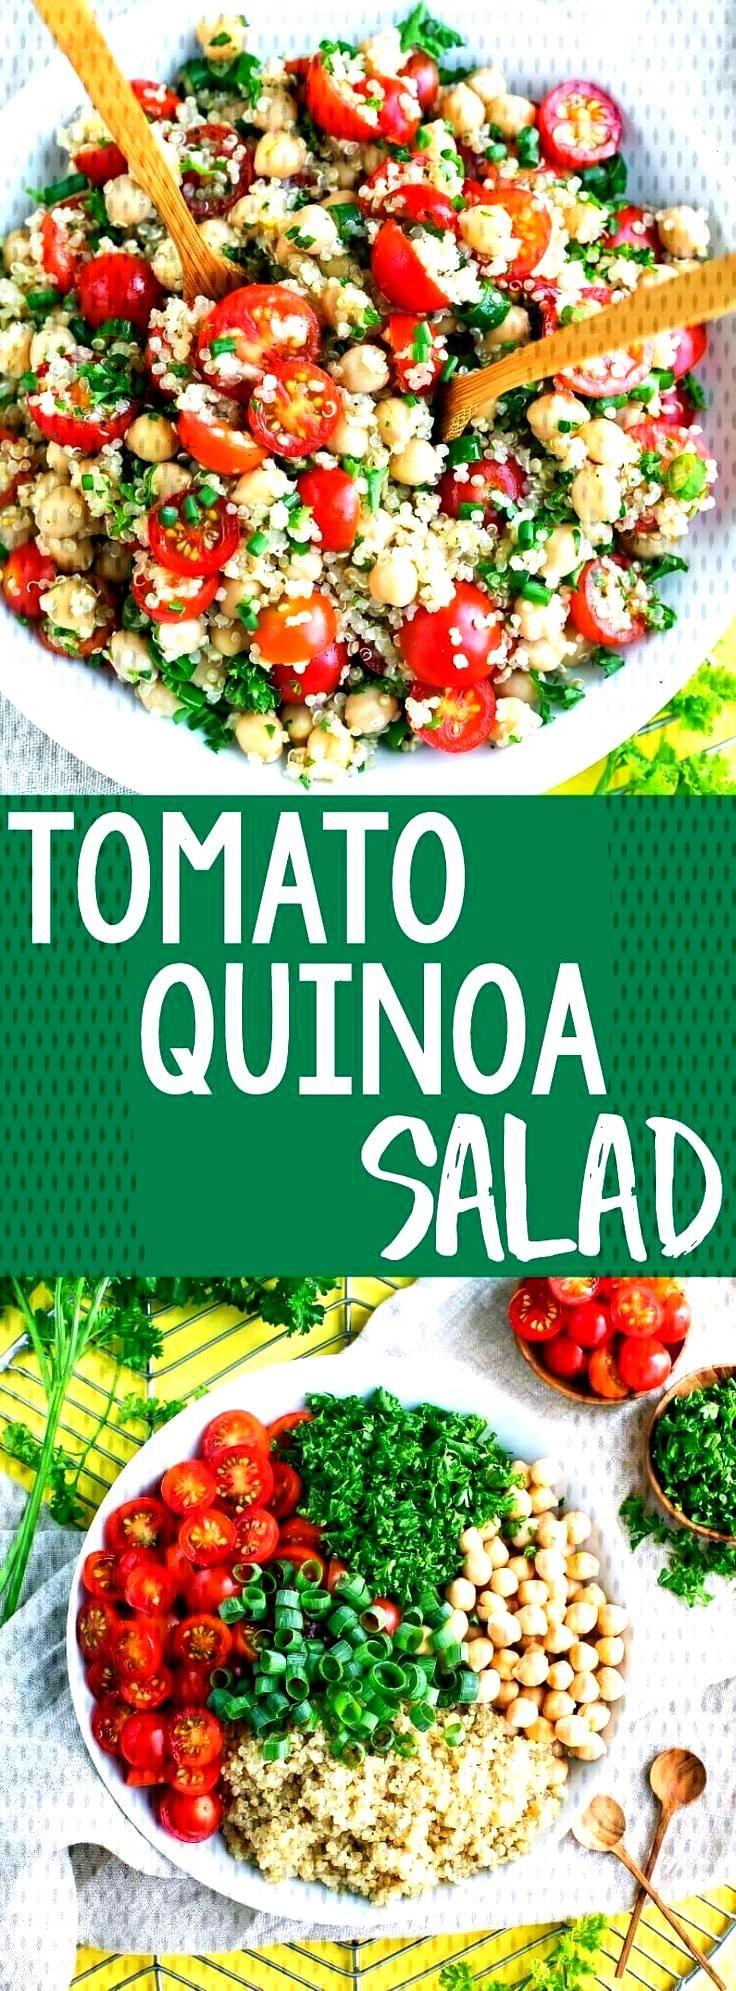 Tomato Quinoa Salad Recipe - Vegan and Gluten-Free - Peas and Crayons -